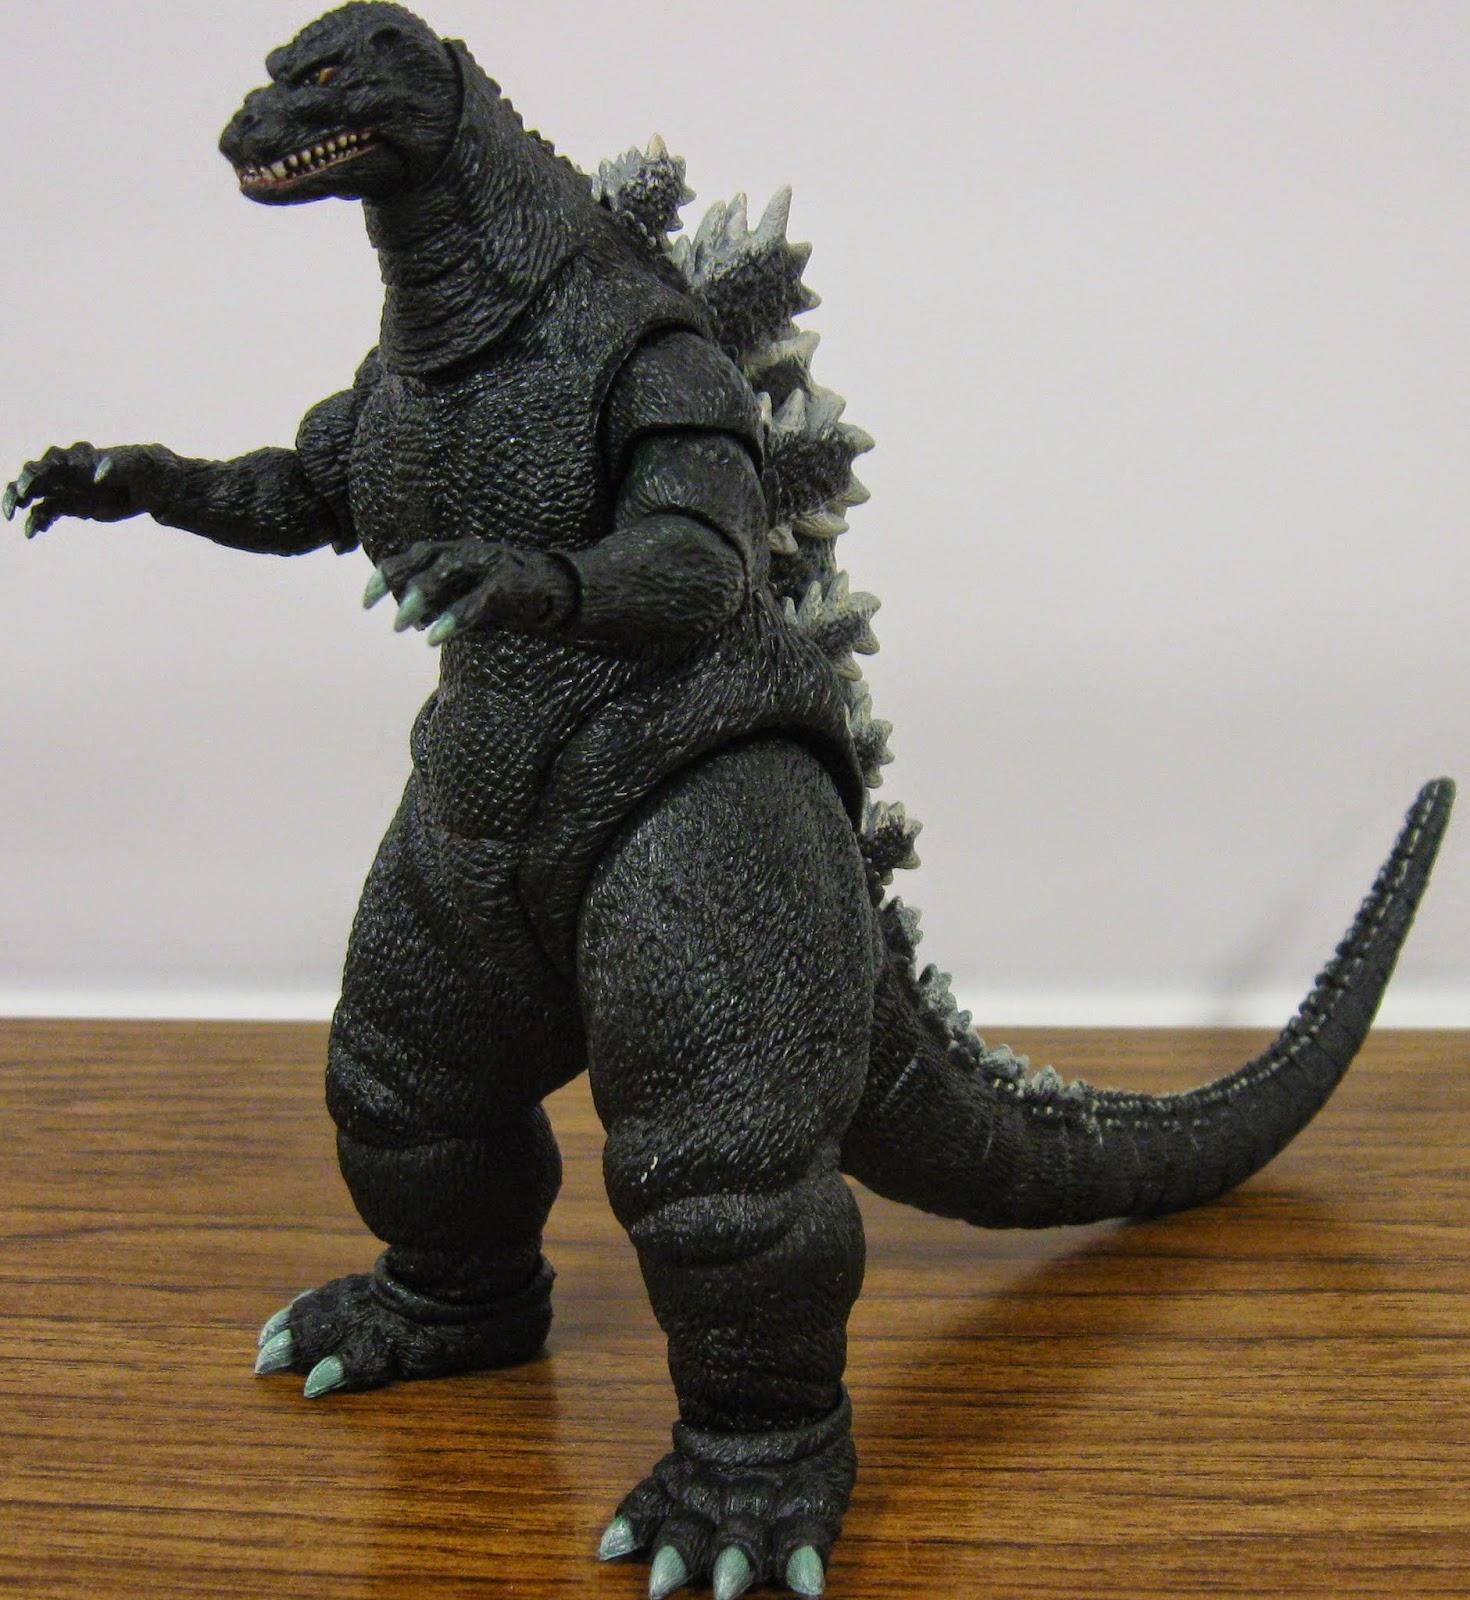 Godzilla vs spacegodzilla cast